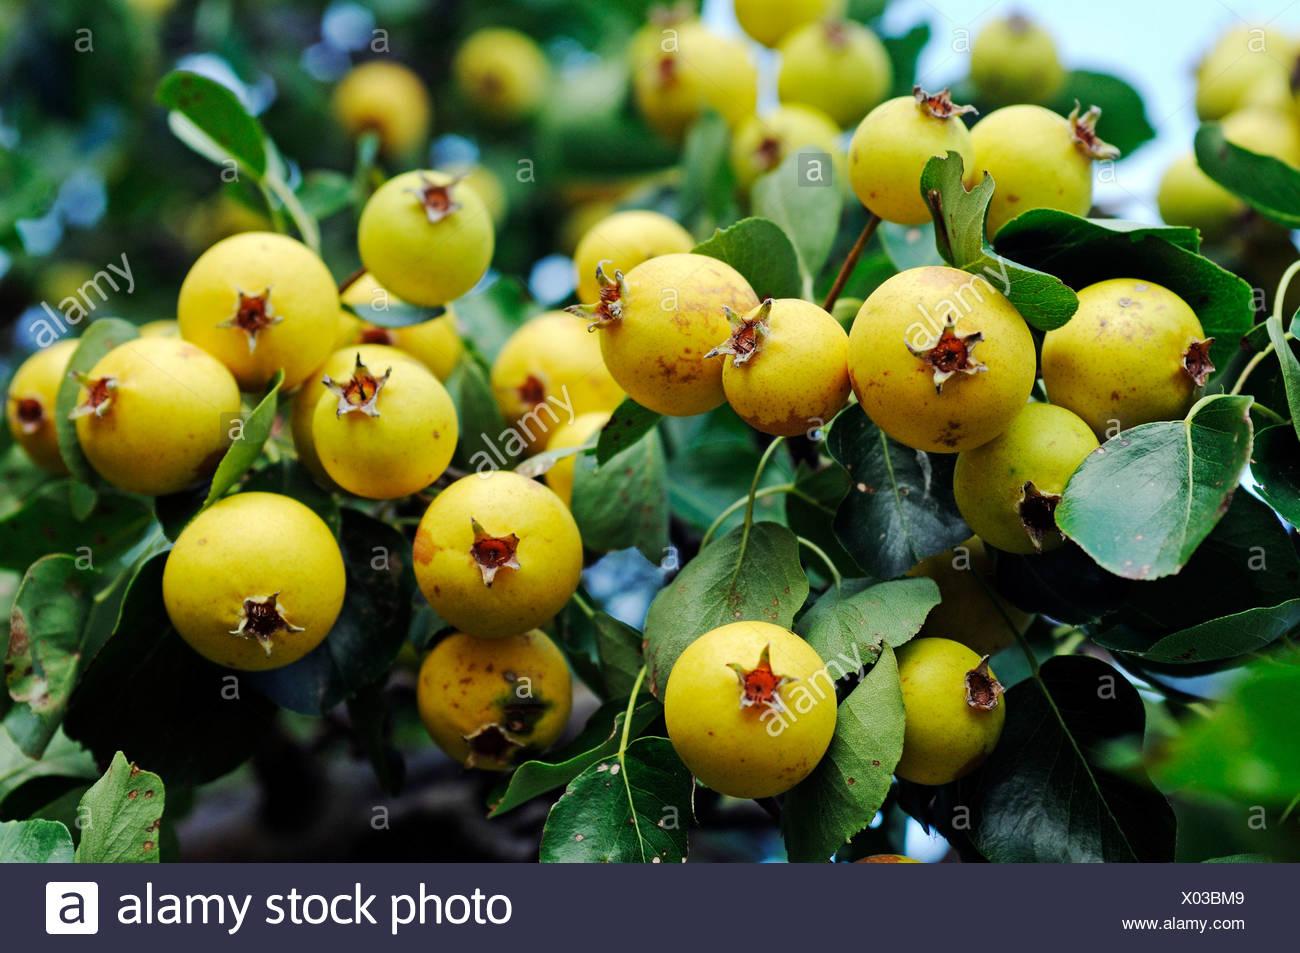 Wild Pear (Pyrus pyraster), pear, Biosphaerenreservat Suedost-Ruegen Biosphere Reserve South-East Ruegen, Ruegen Island - Stock Image